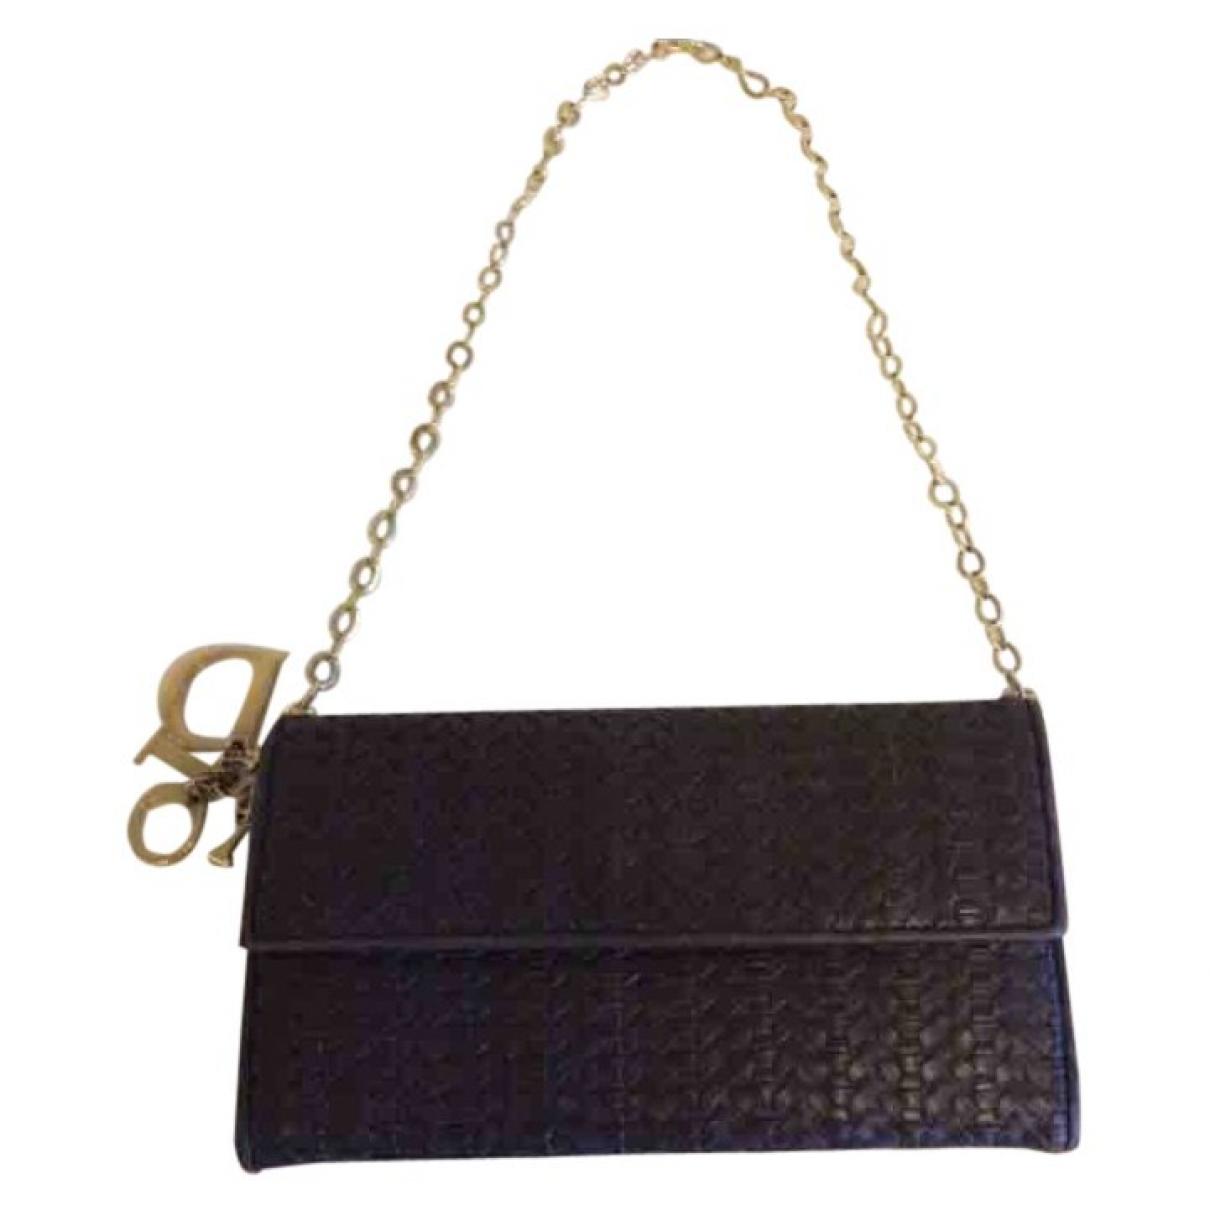 Dior Lady Dior Brown Leather Clutch bag for Women \N